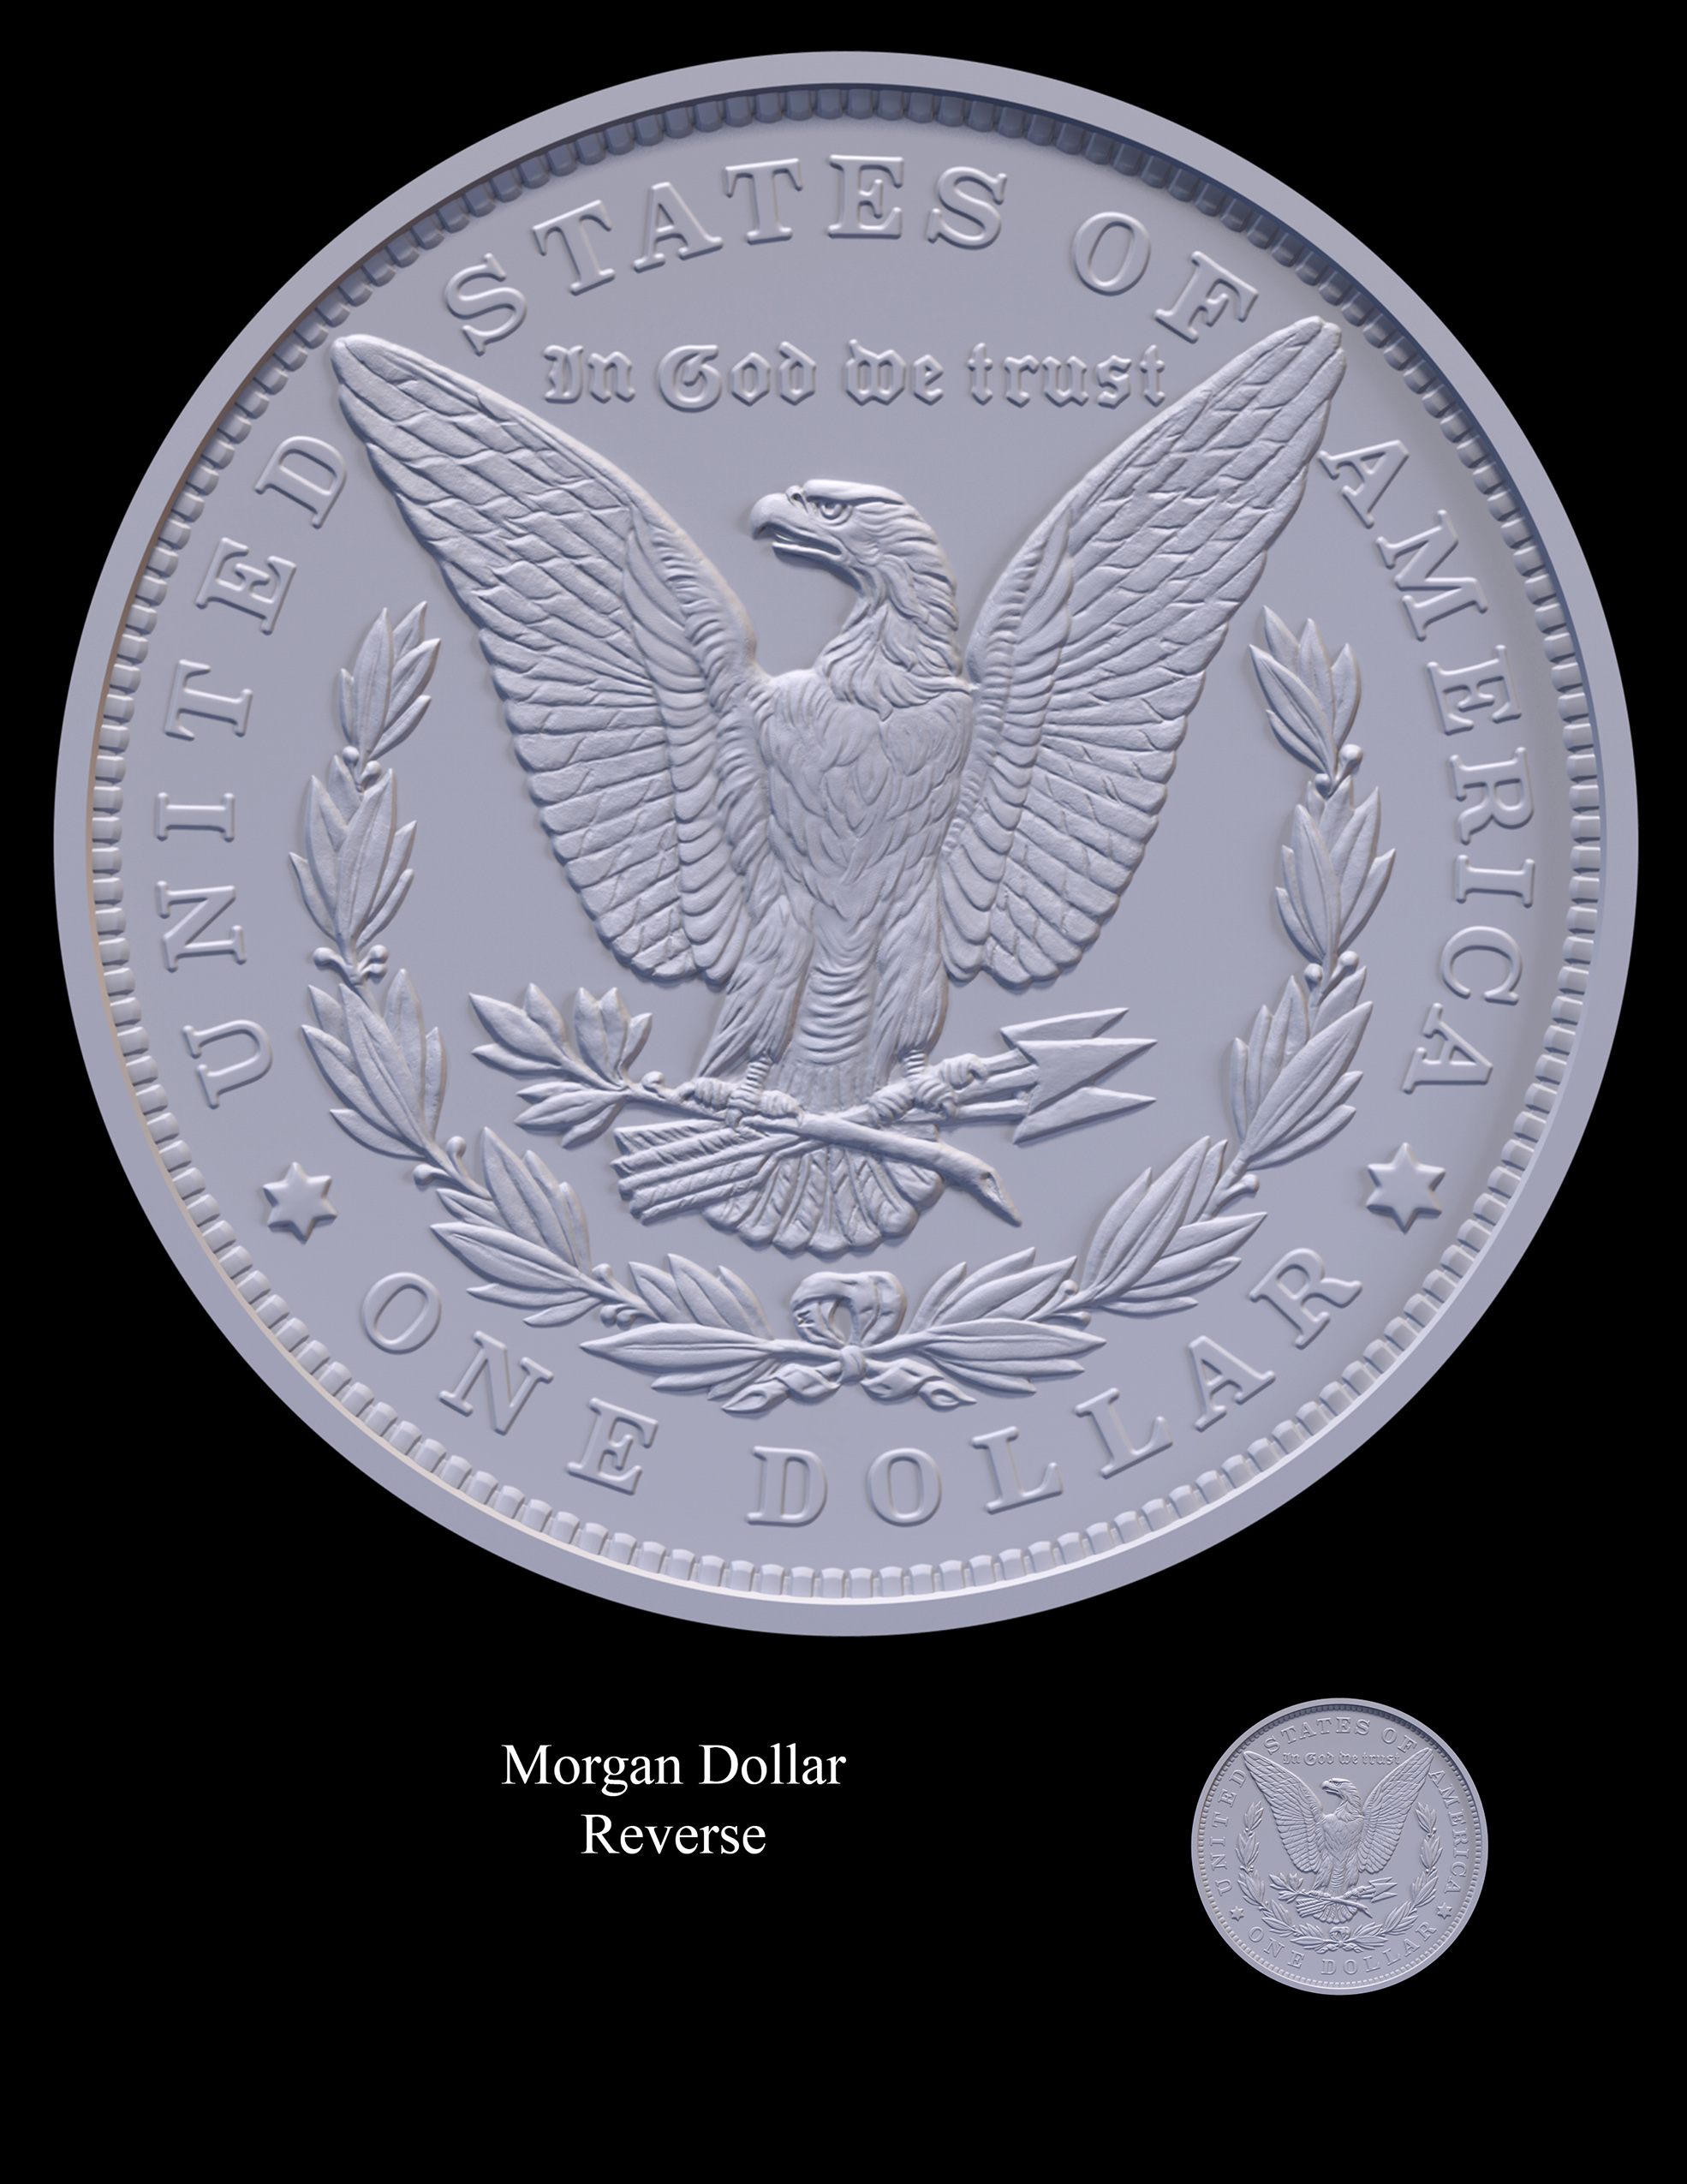 Morgan Reverse -- 2021 Morgan Dollar